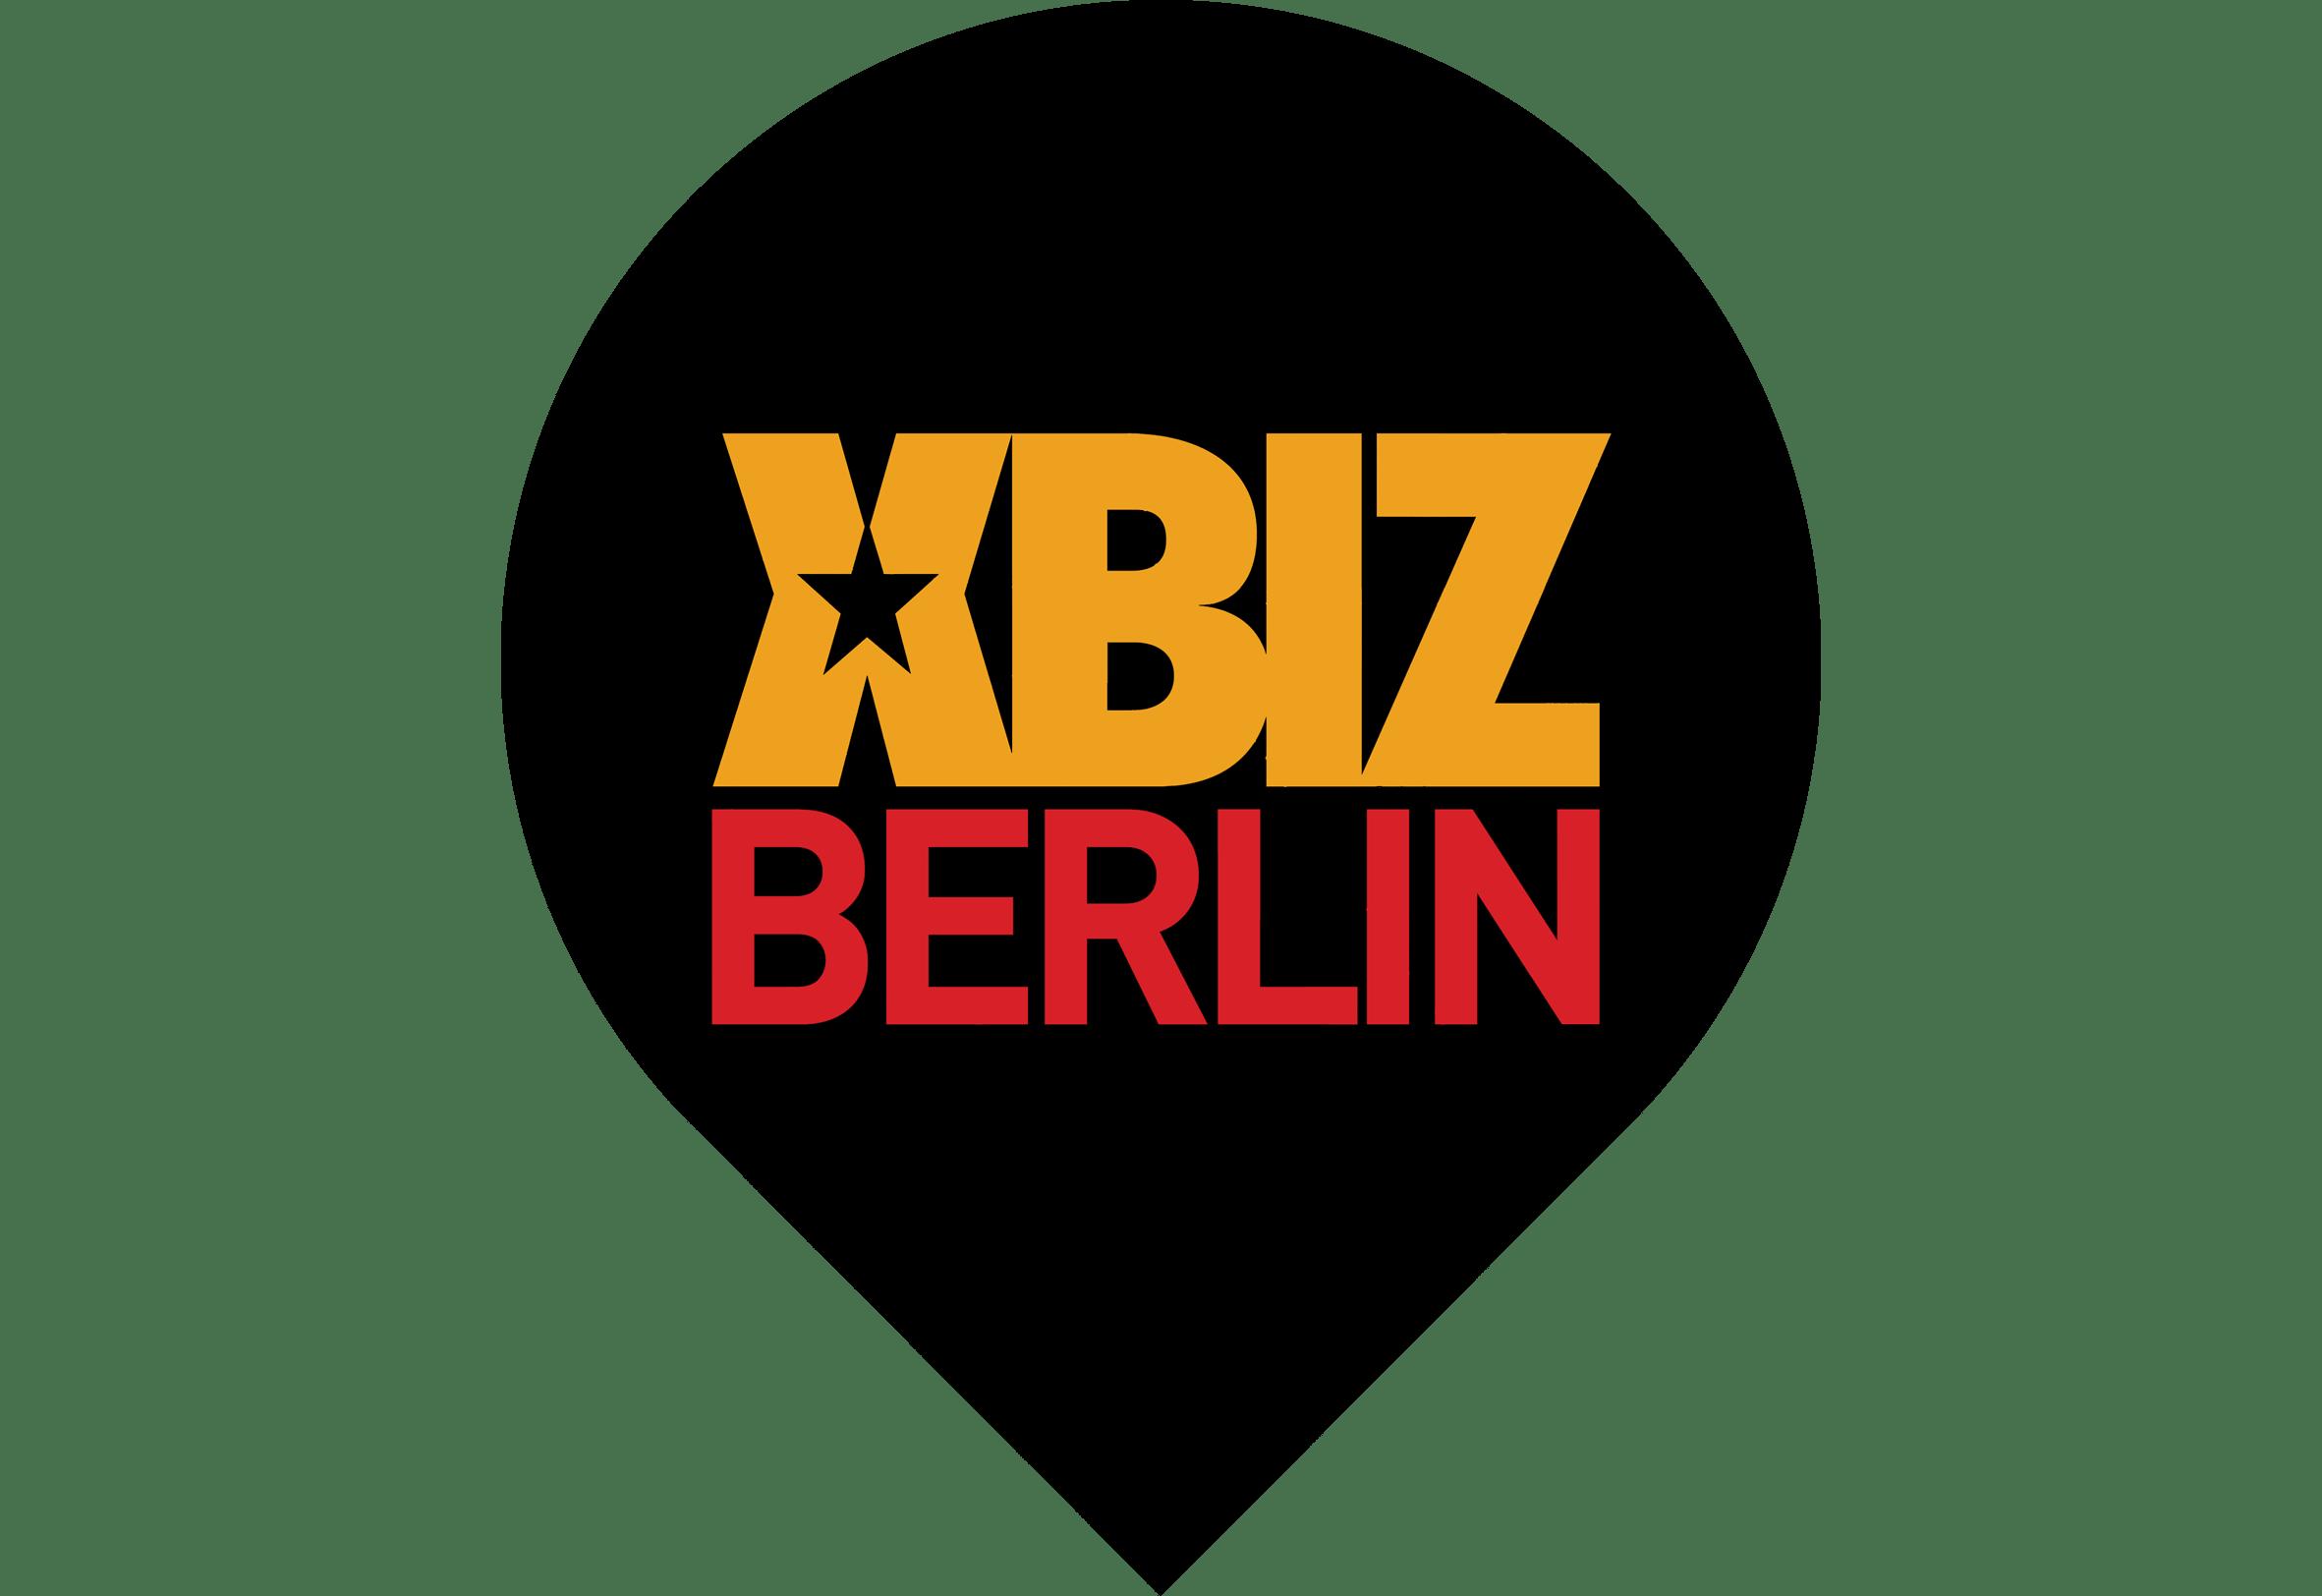 XBIZ Berlin Virtual